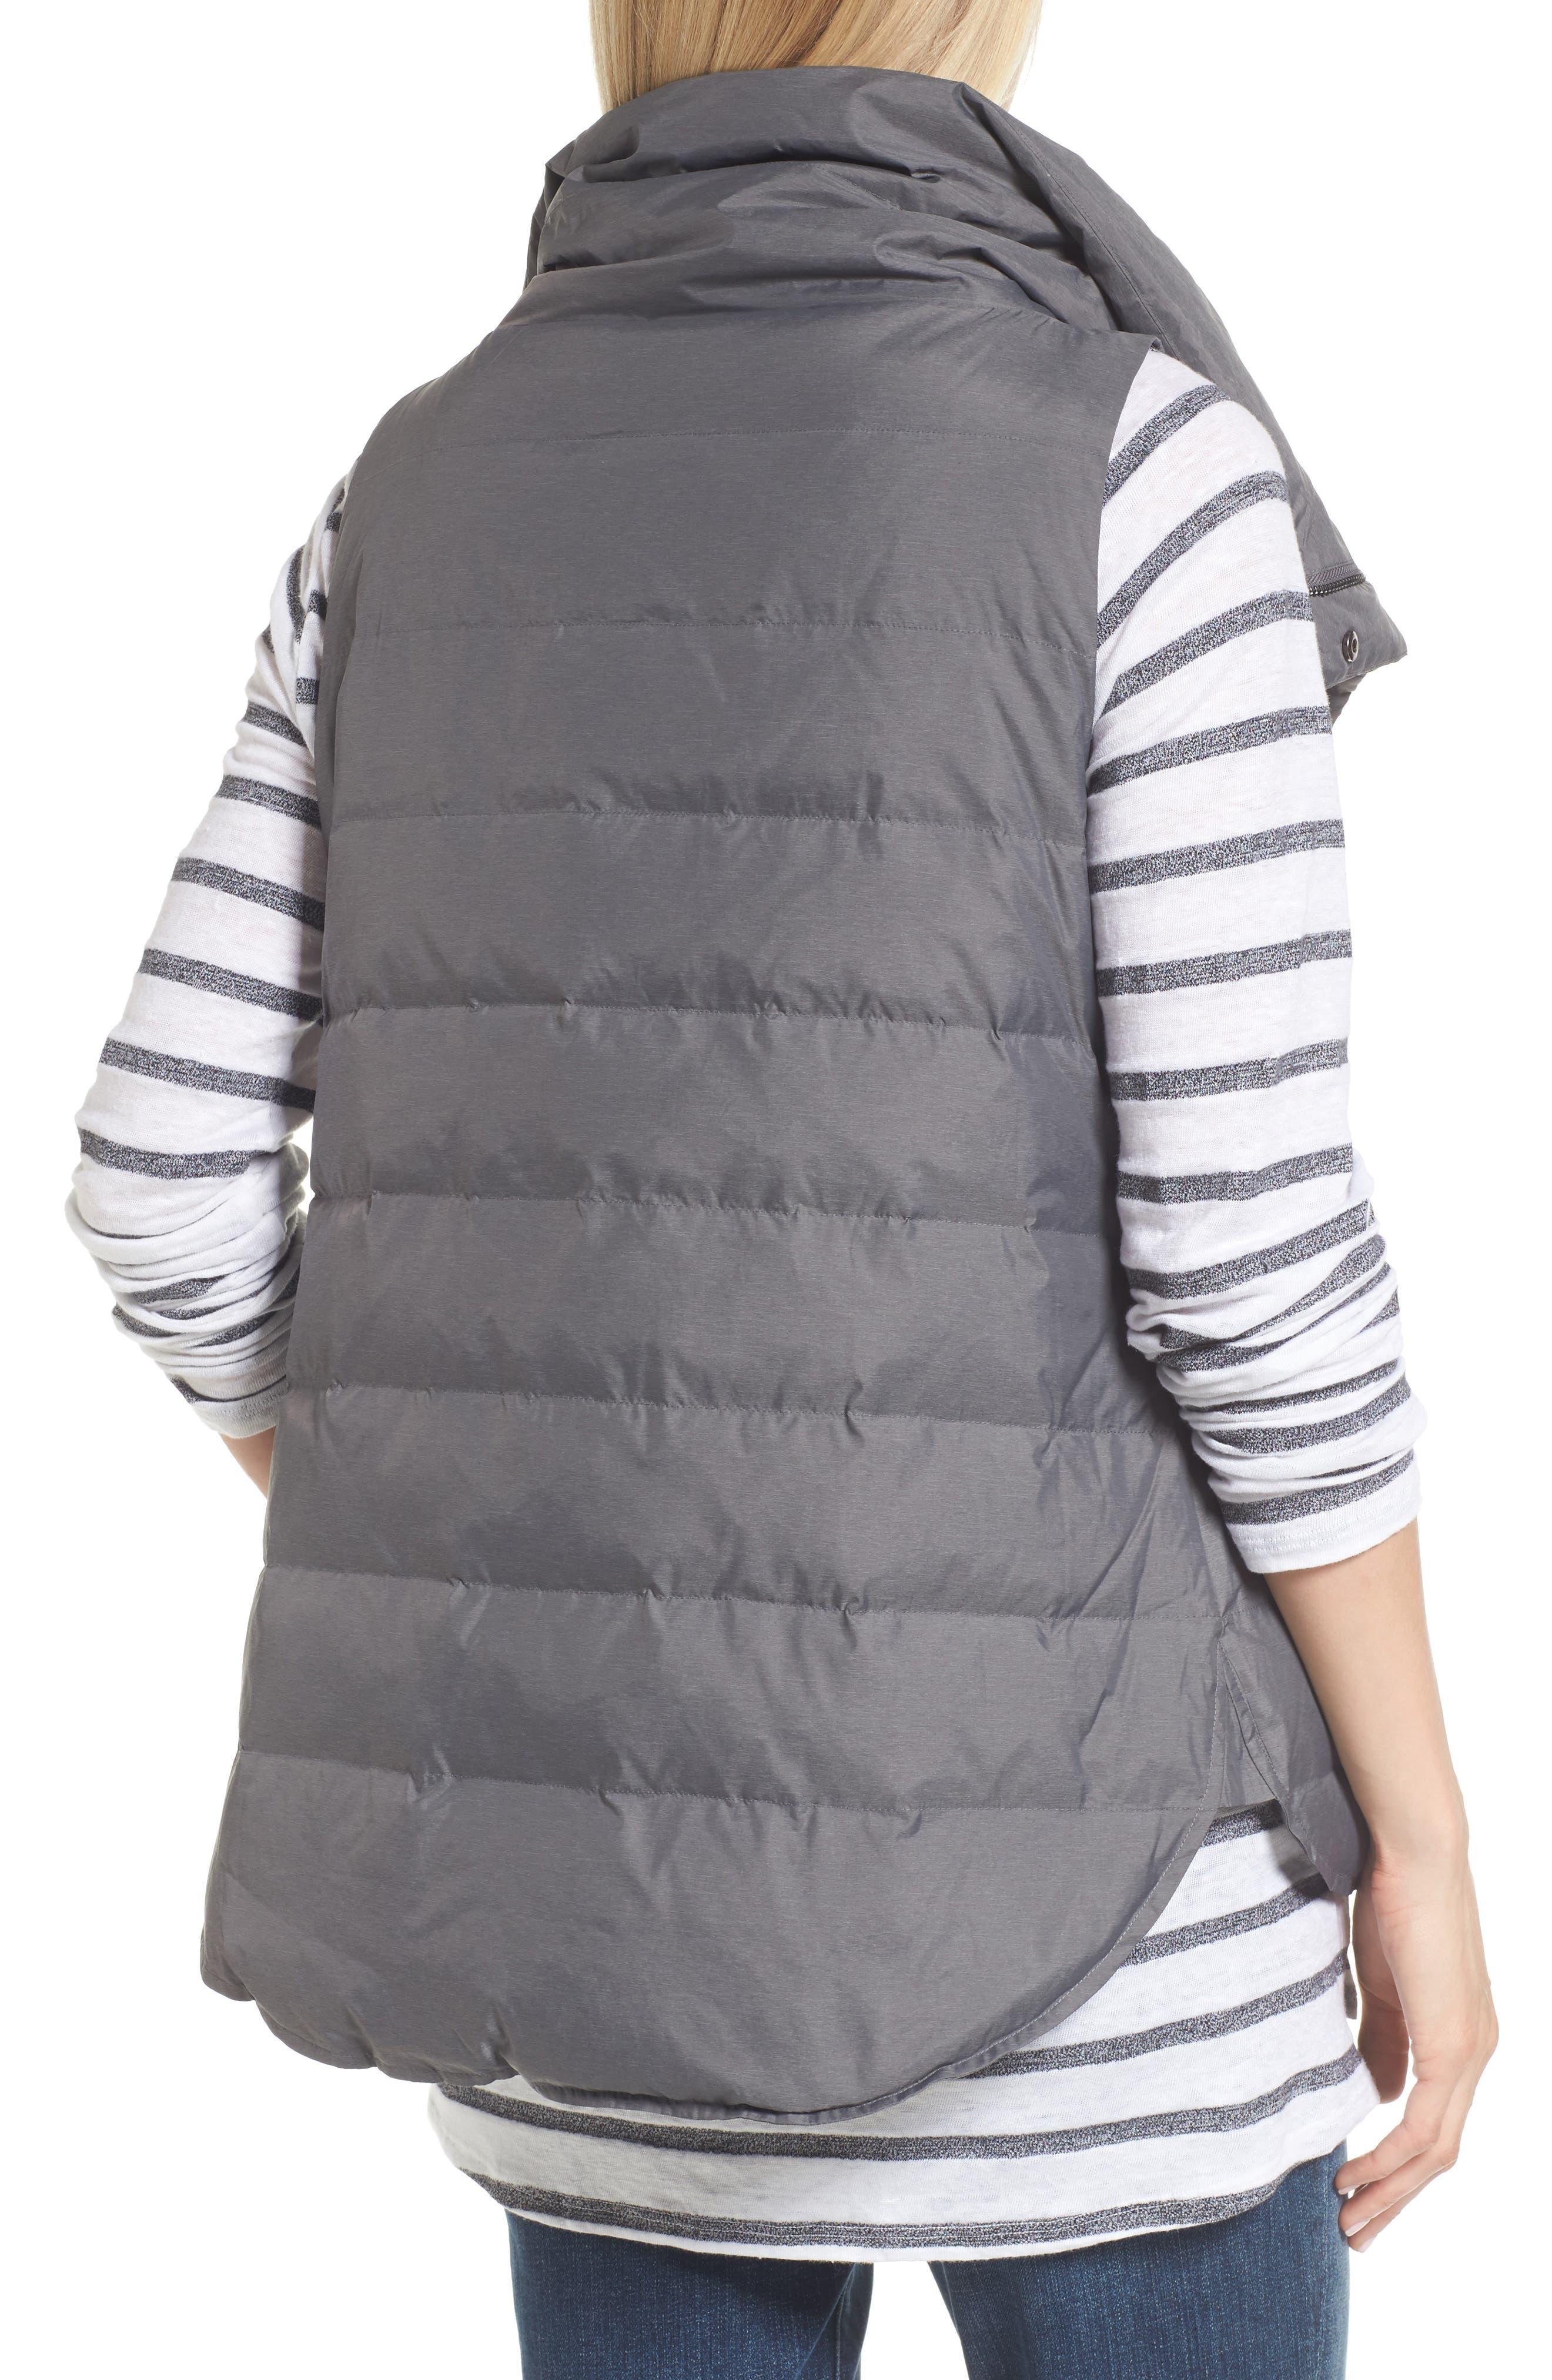 Stand Collar Vest,                             Alternate thumbnail 2, color,                             Ash